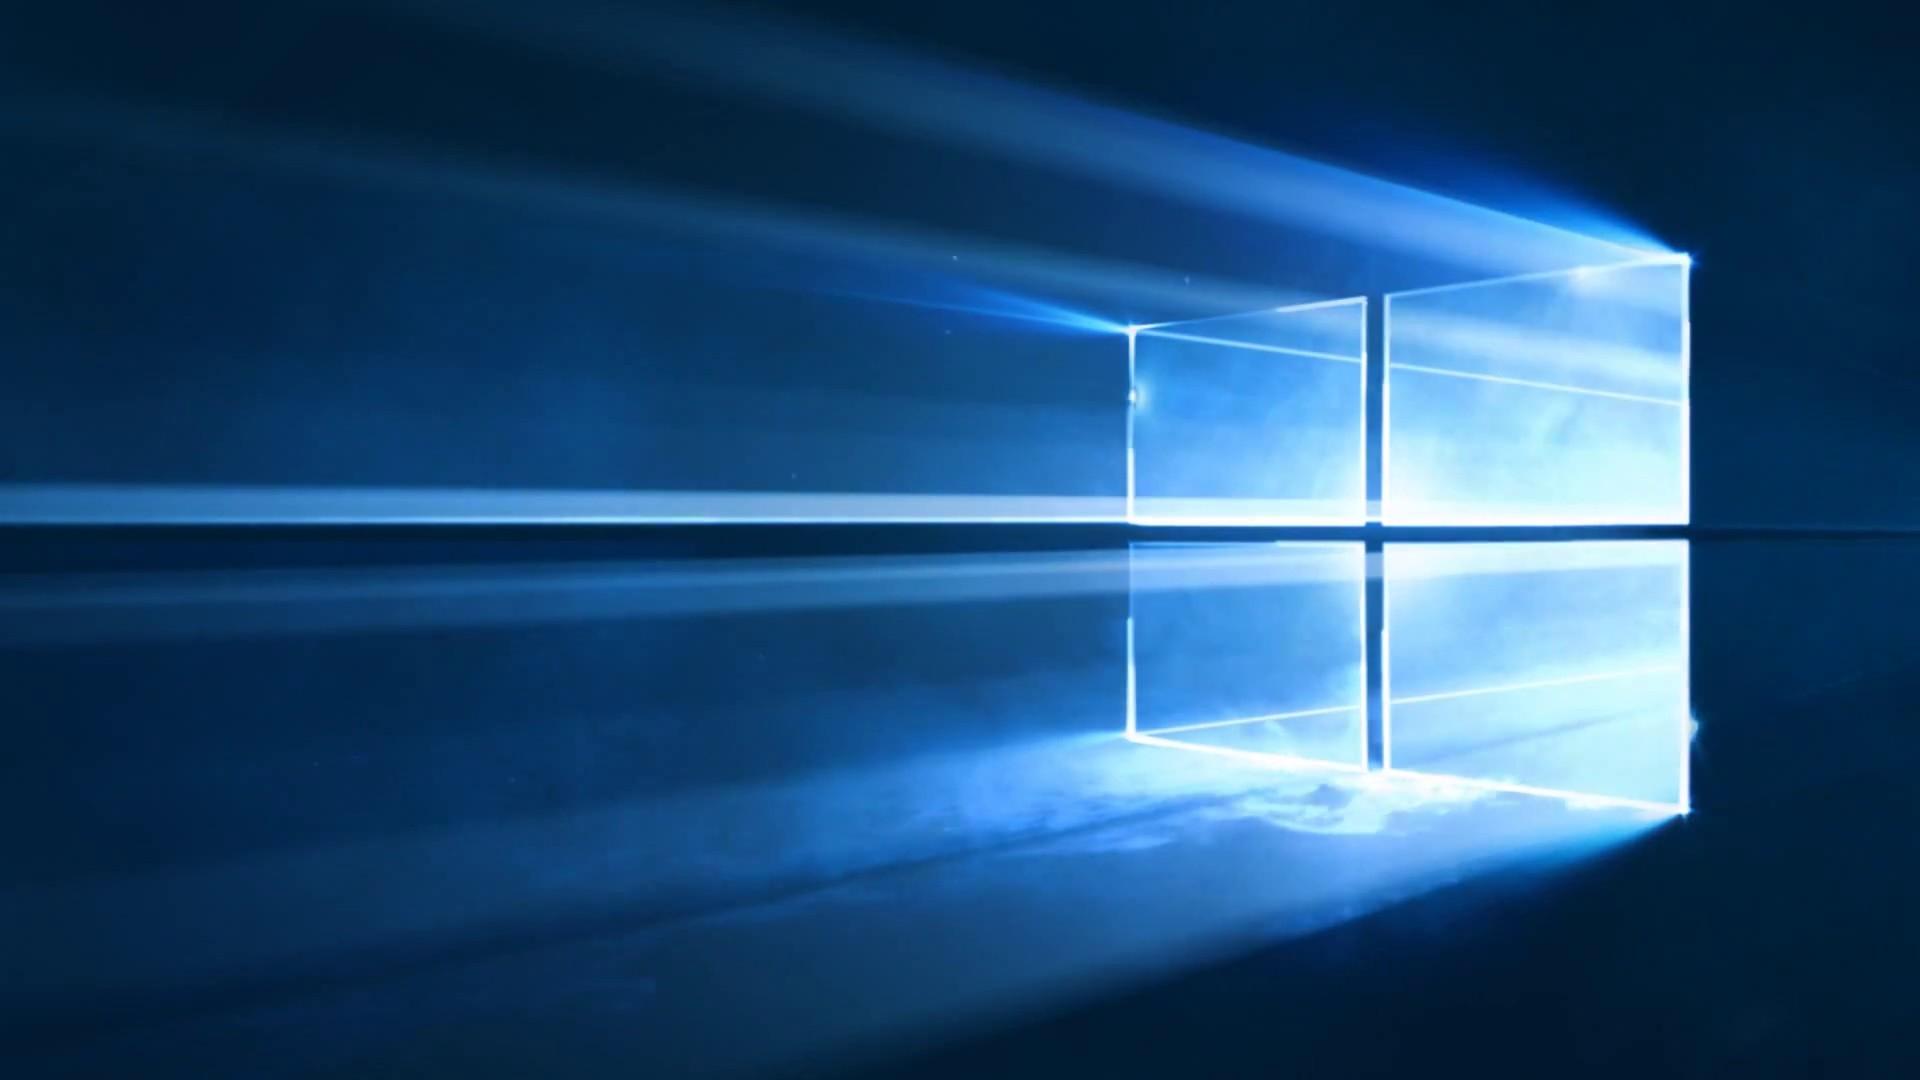 Windows 10 Gaming Wallpapers